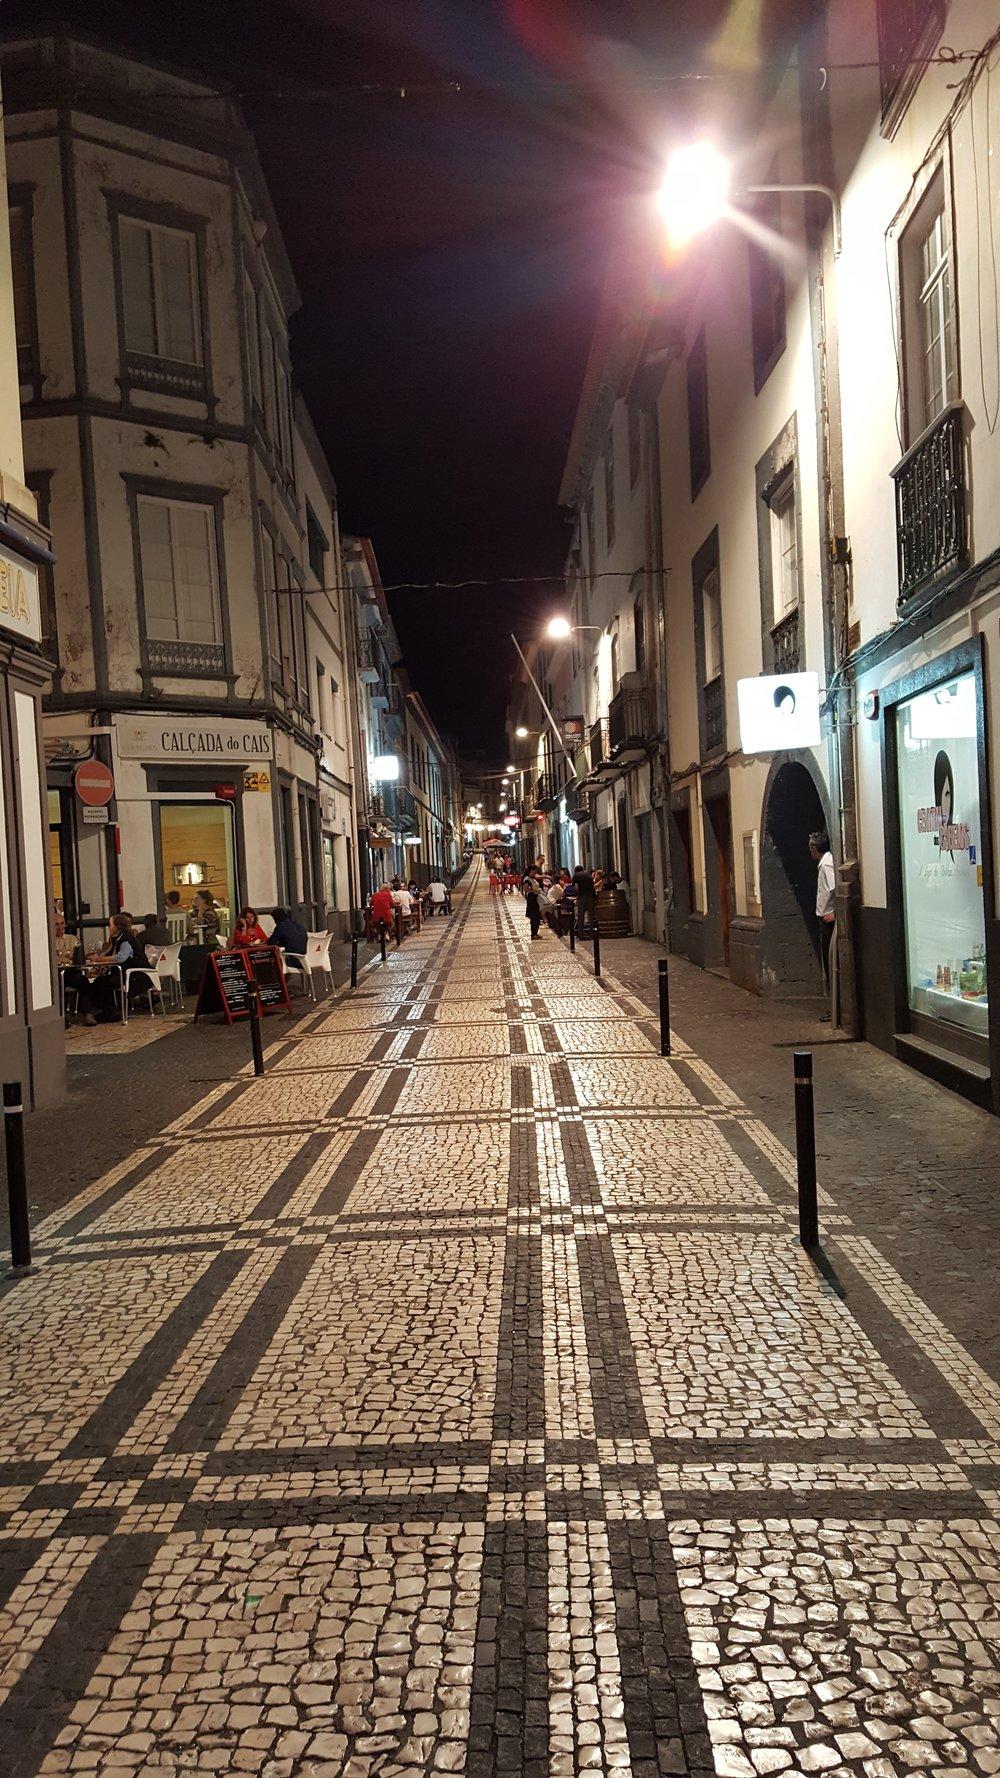 The City of Ponta Delgada